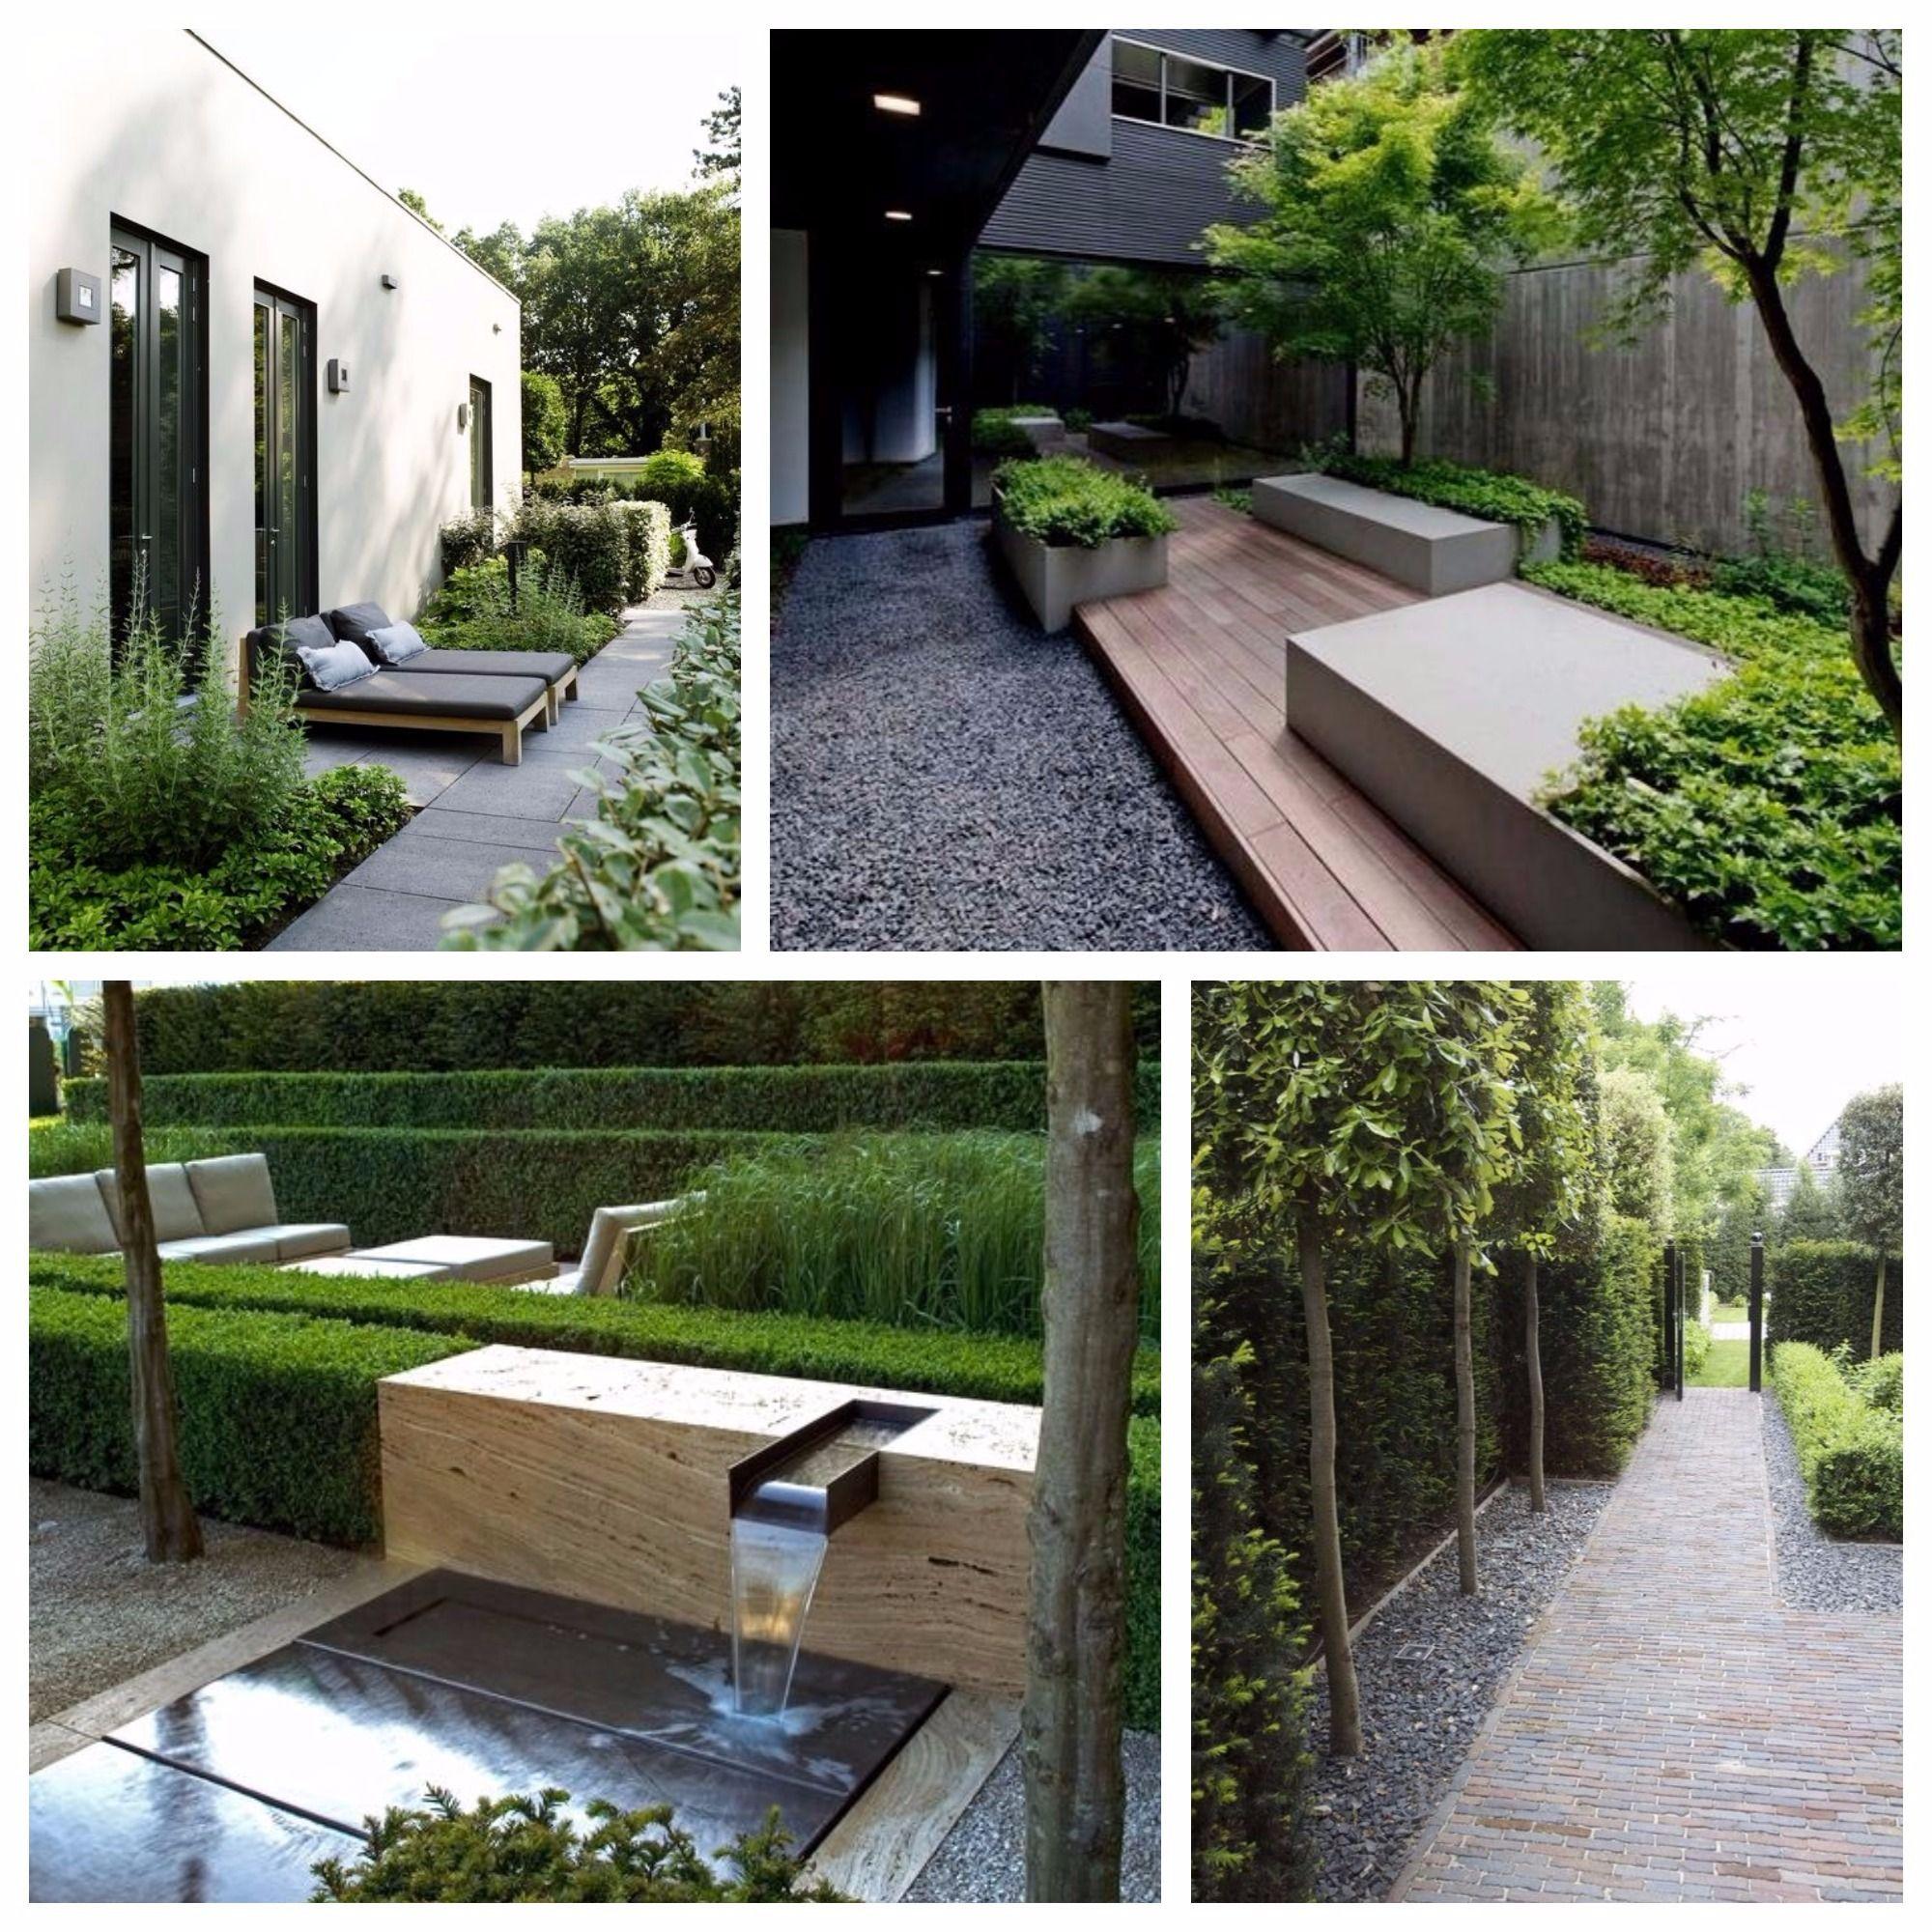 Ideas para jardines sin c sped la habitaci n verde for Cesped para jardin